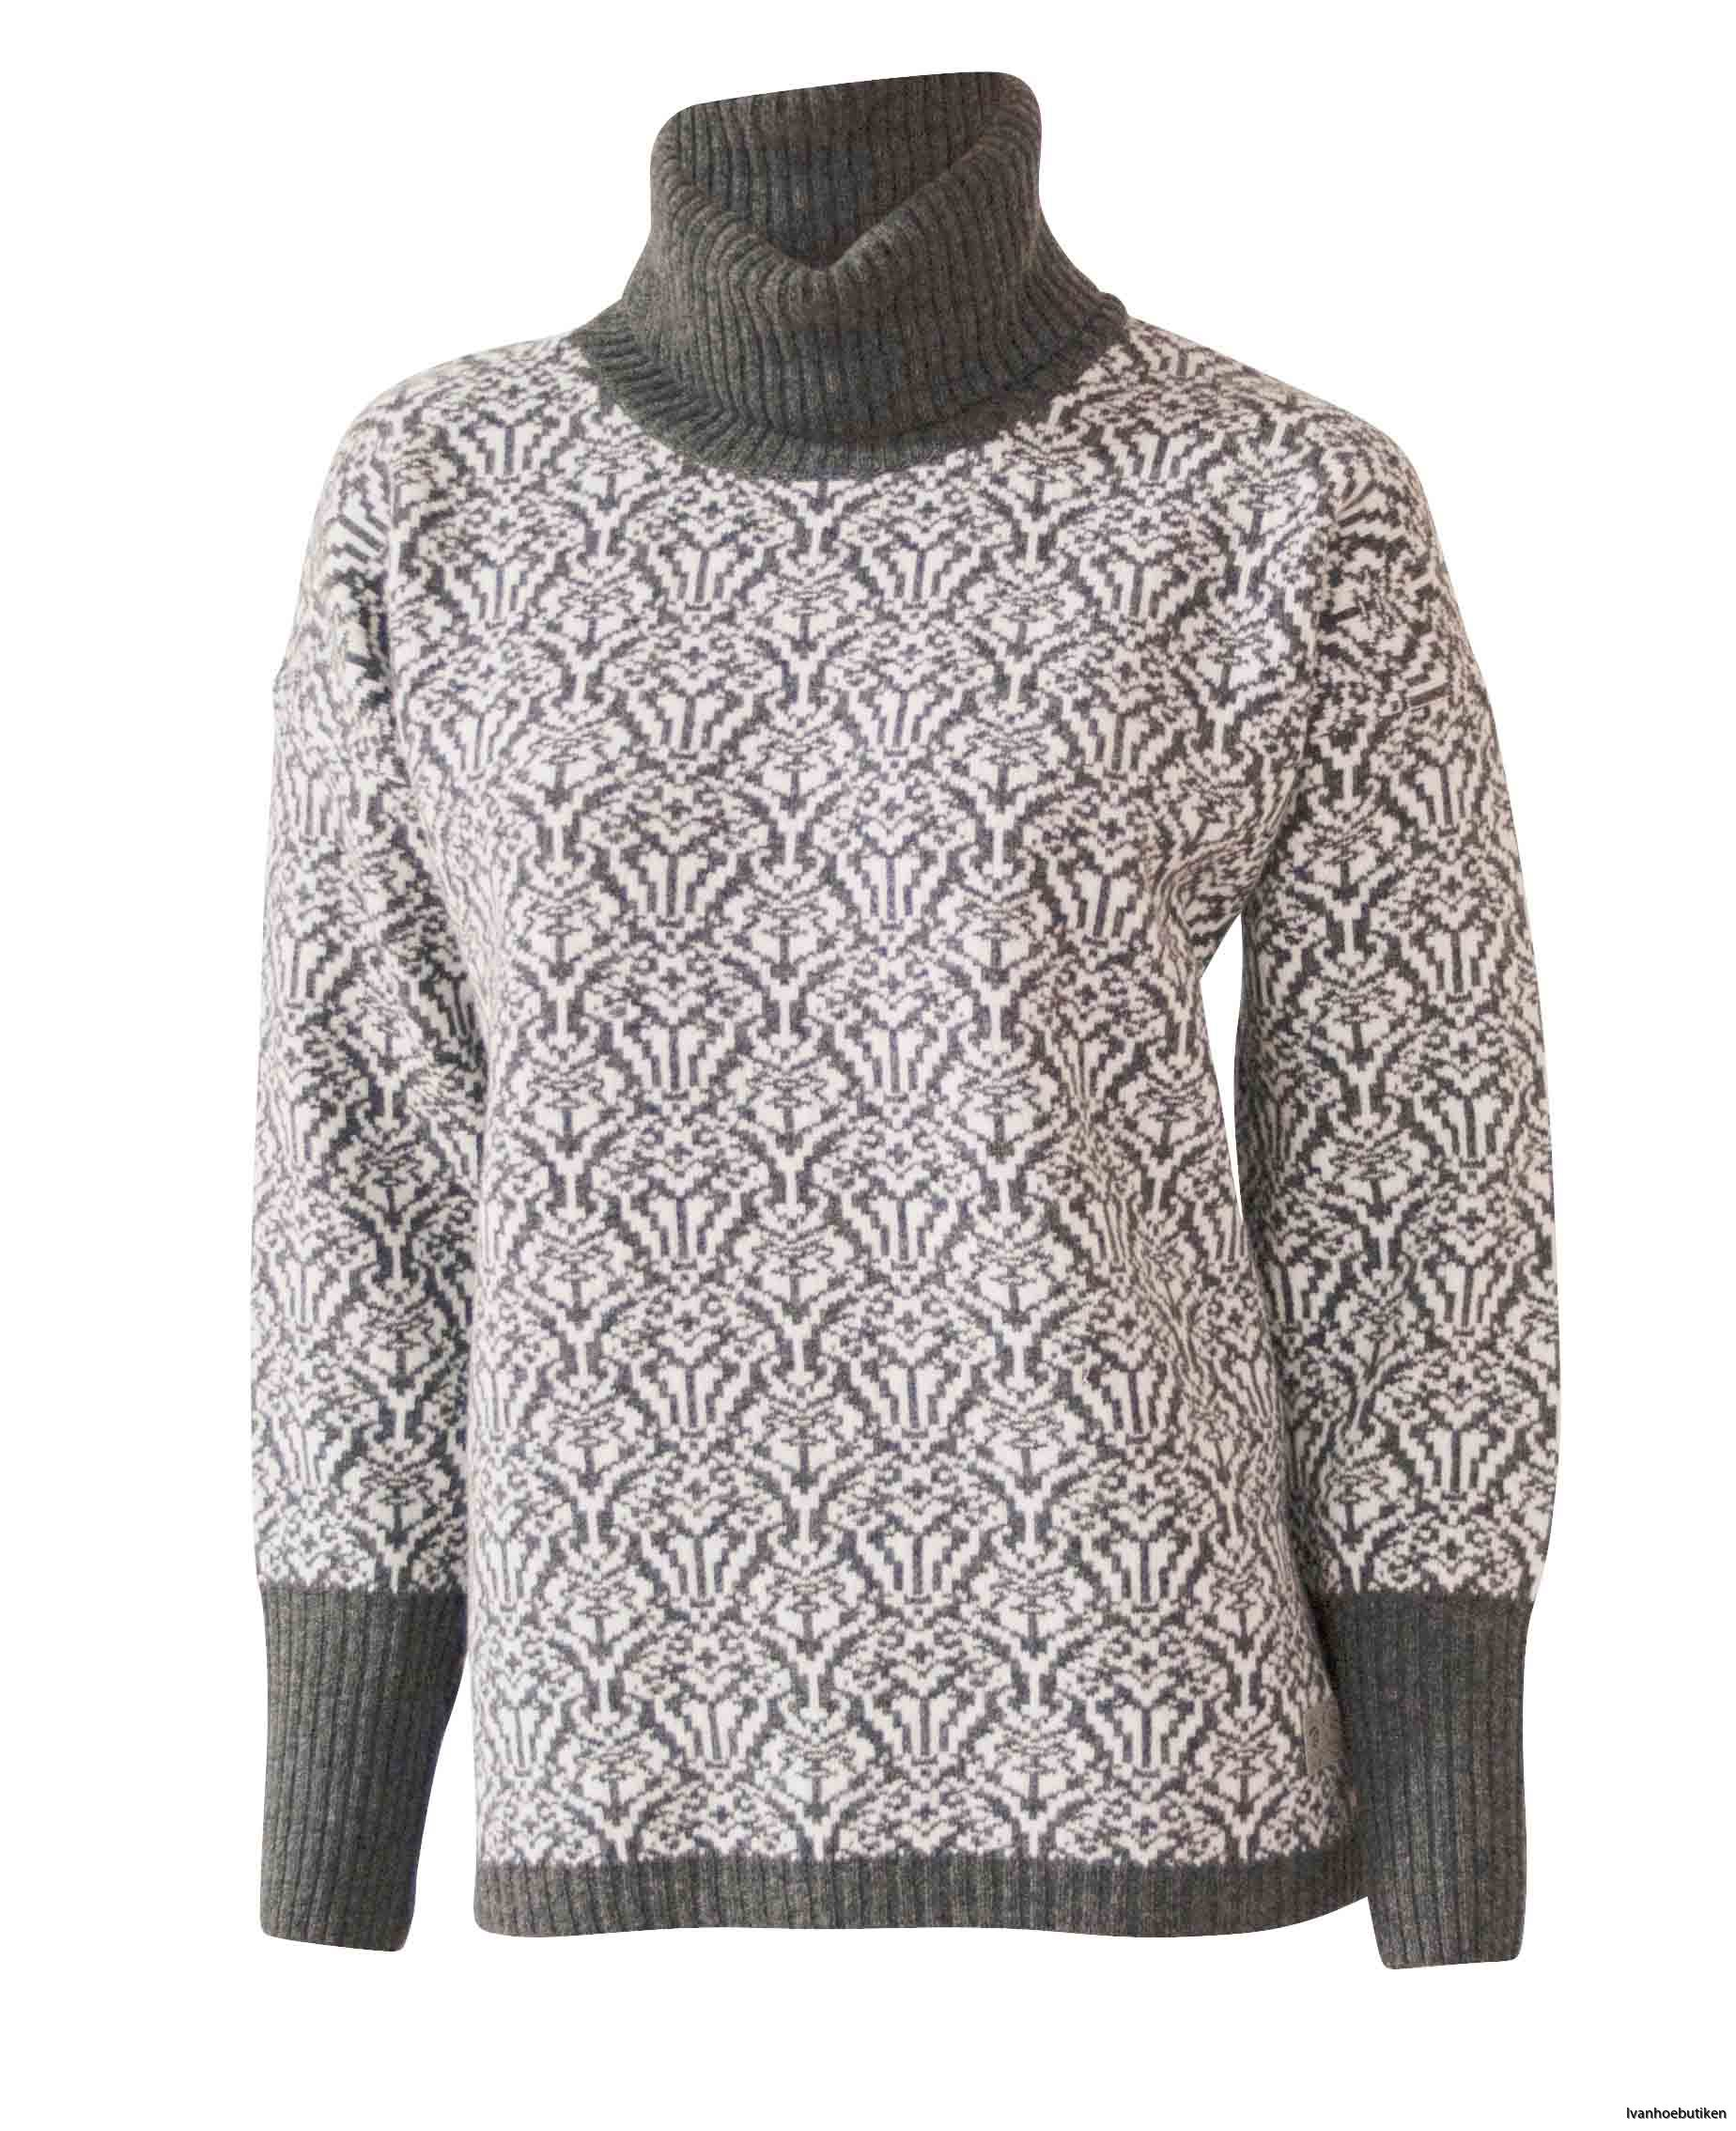 GY_Korrebo_Sweater_013